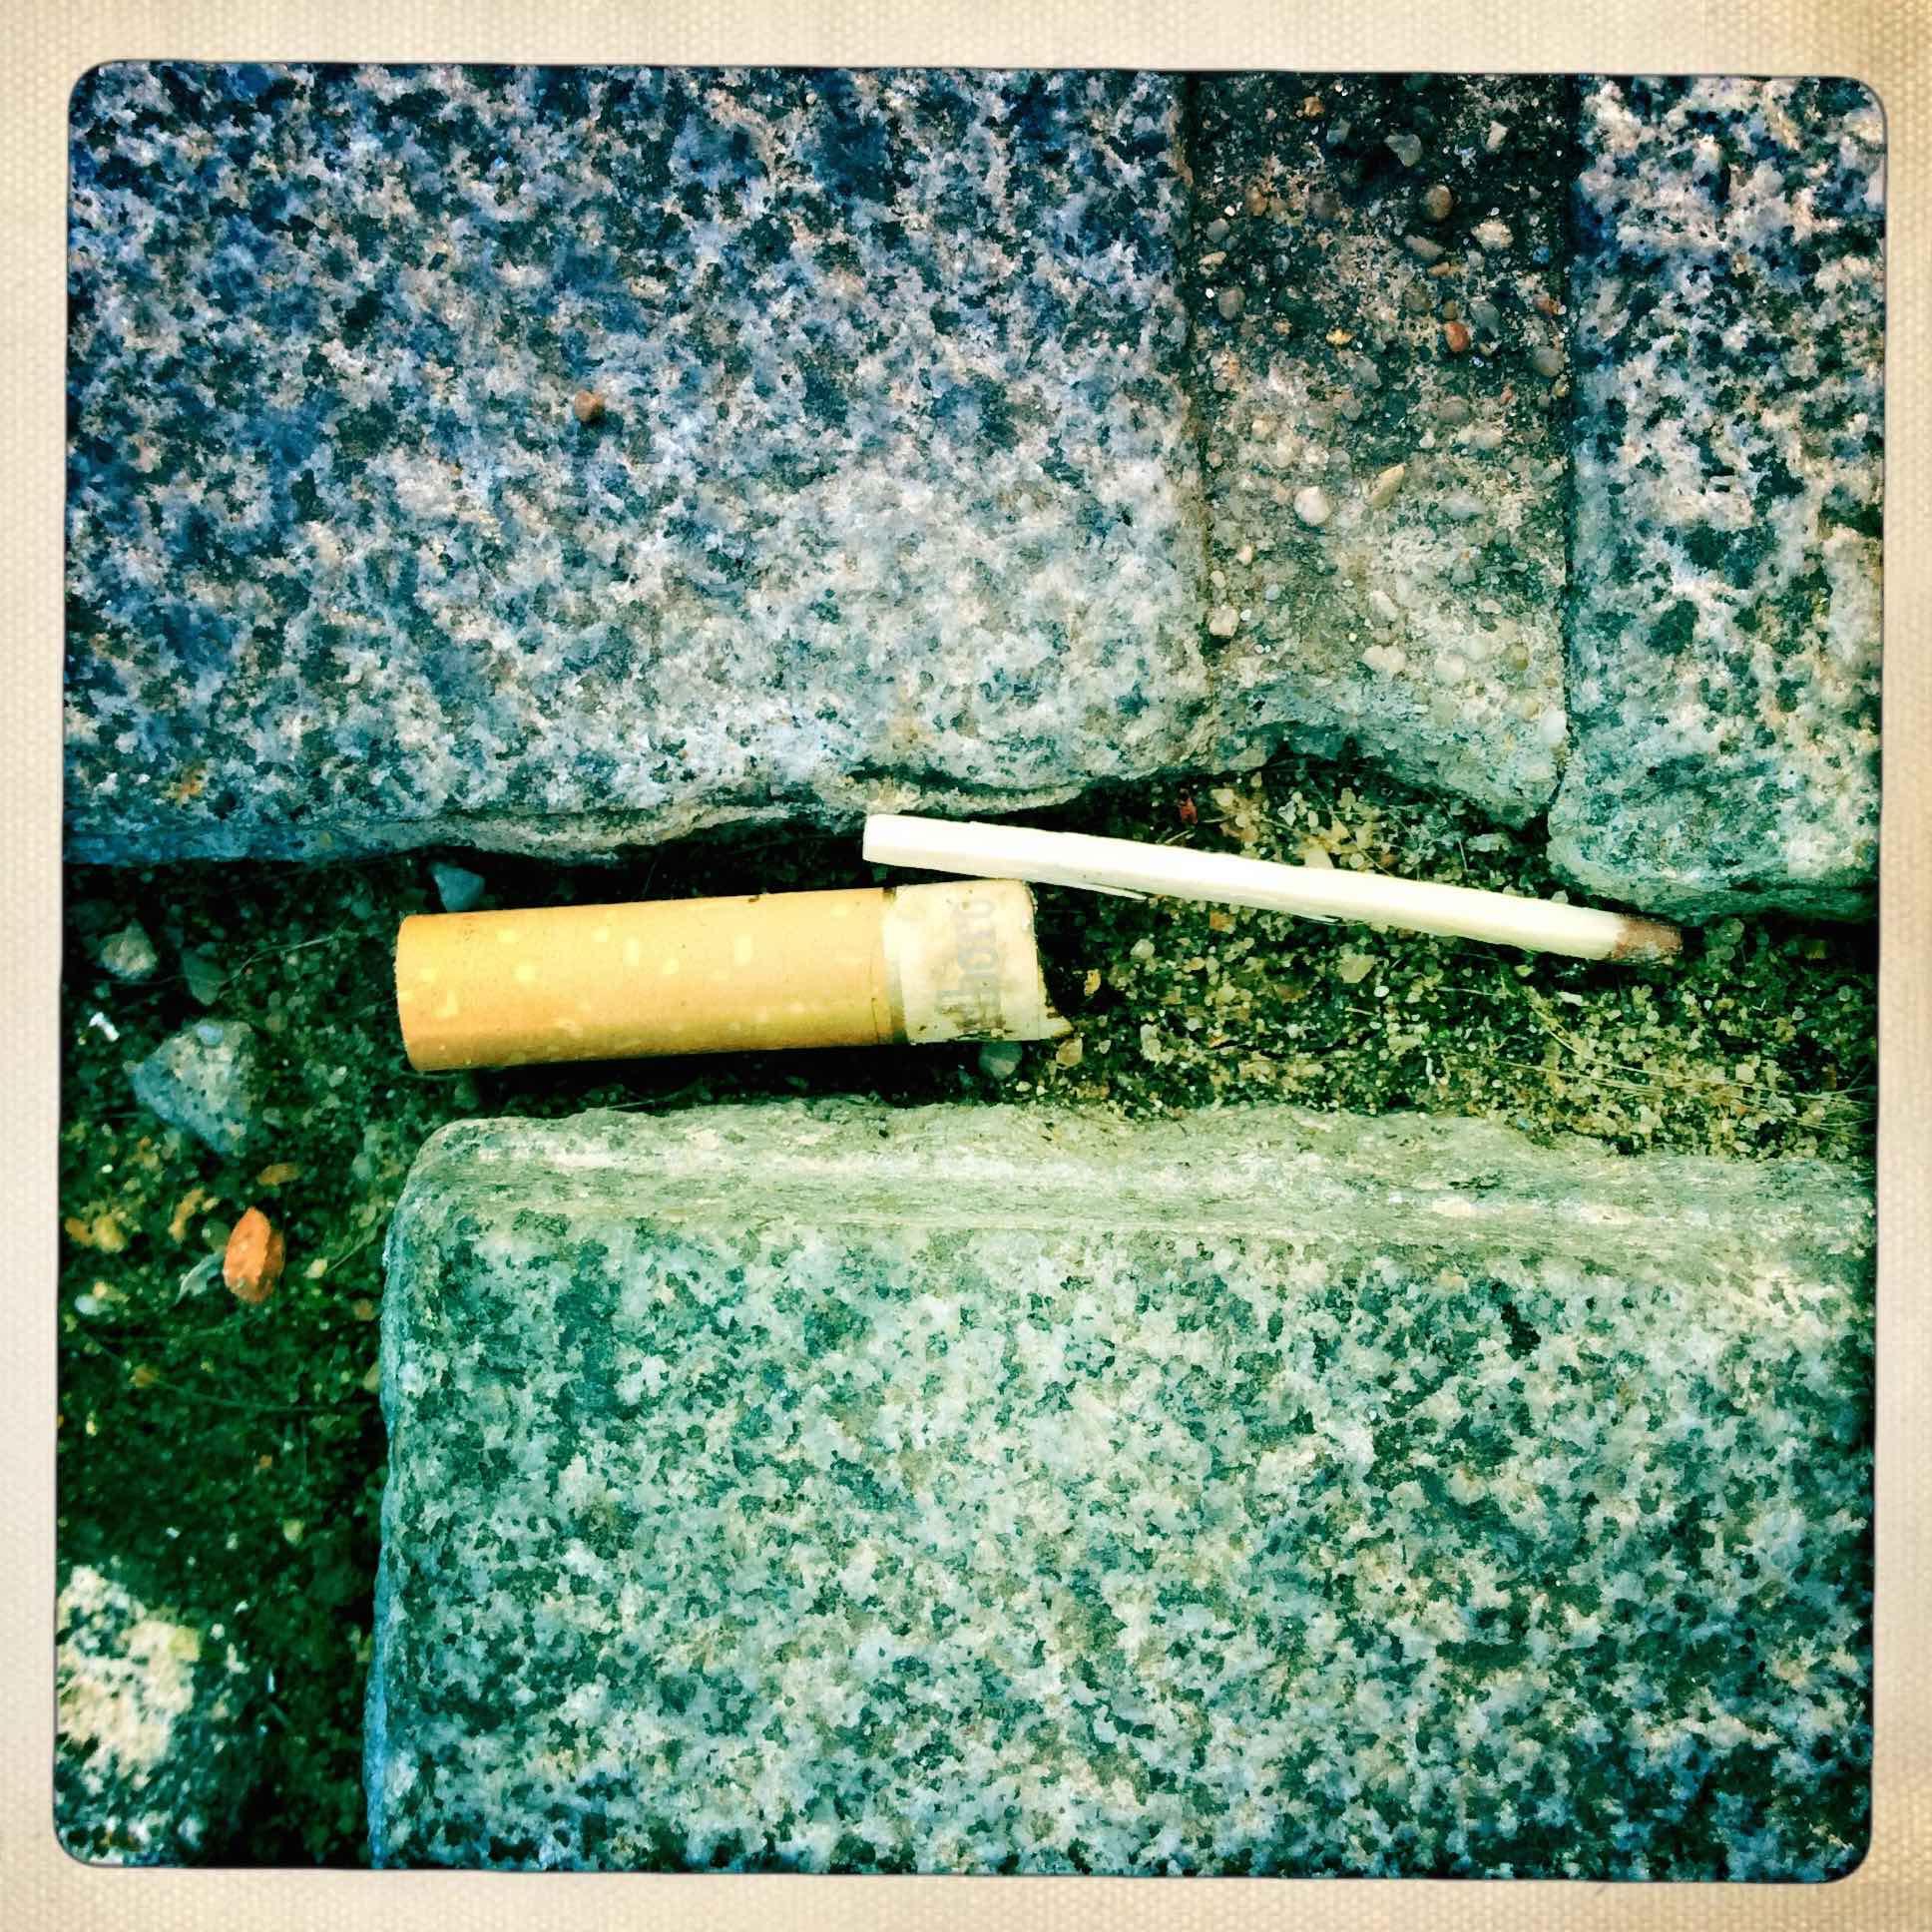 Antwerpen, Preservation Stick  2014; photograph;  Copyright © Tennyson Woodbridge, 1963 to present